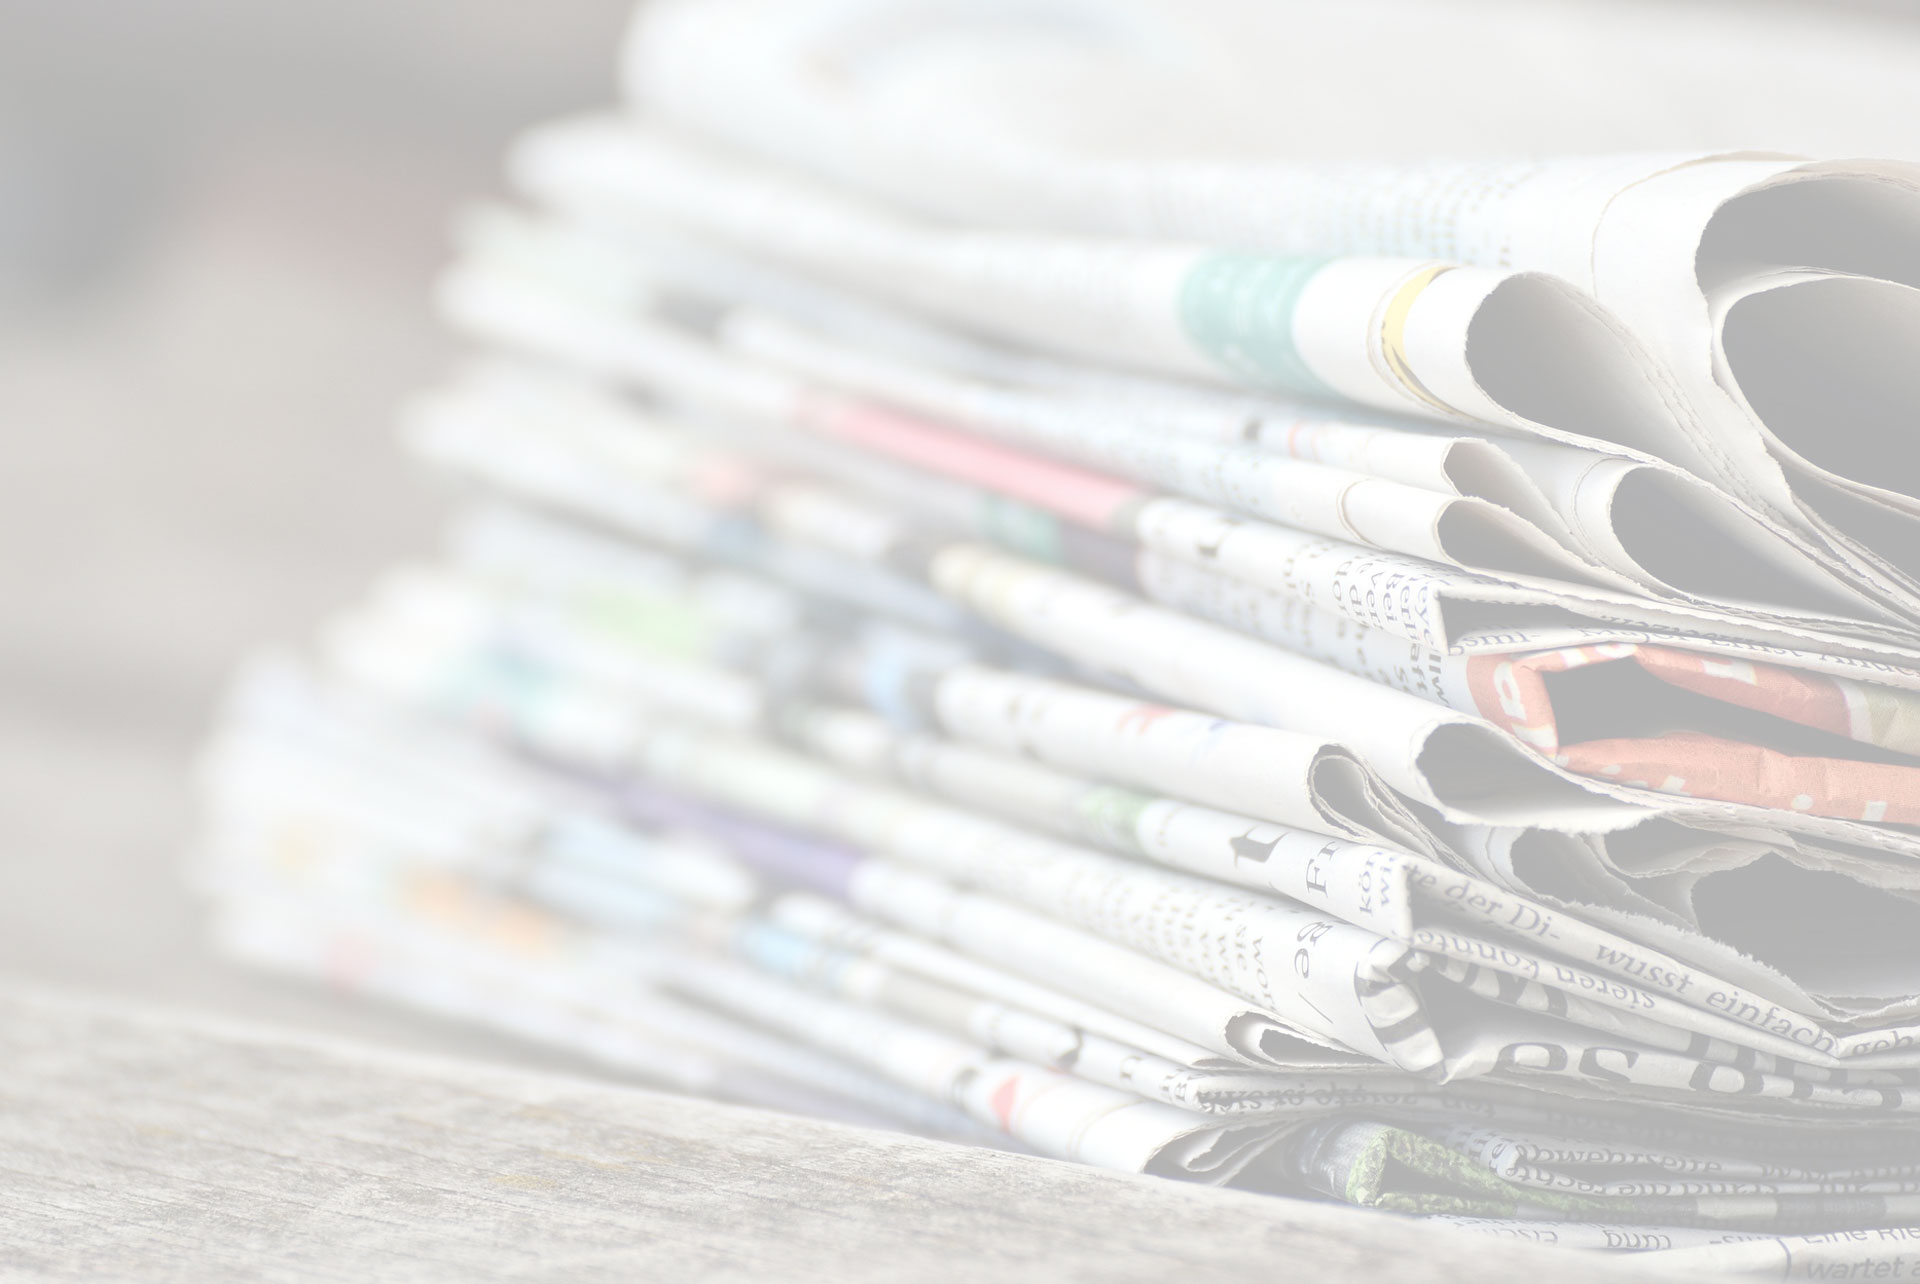 Johan Cruijff con la maglia del Milan